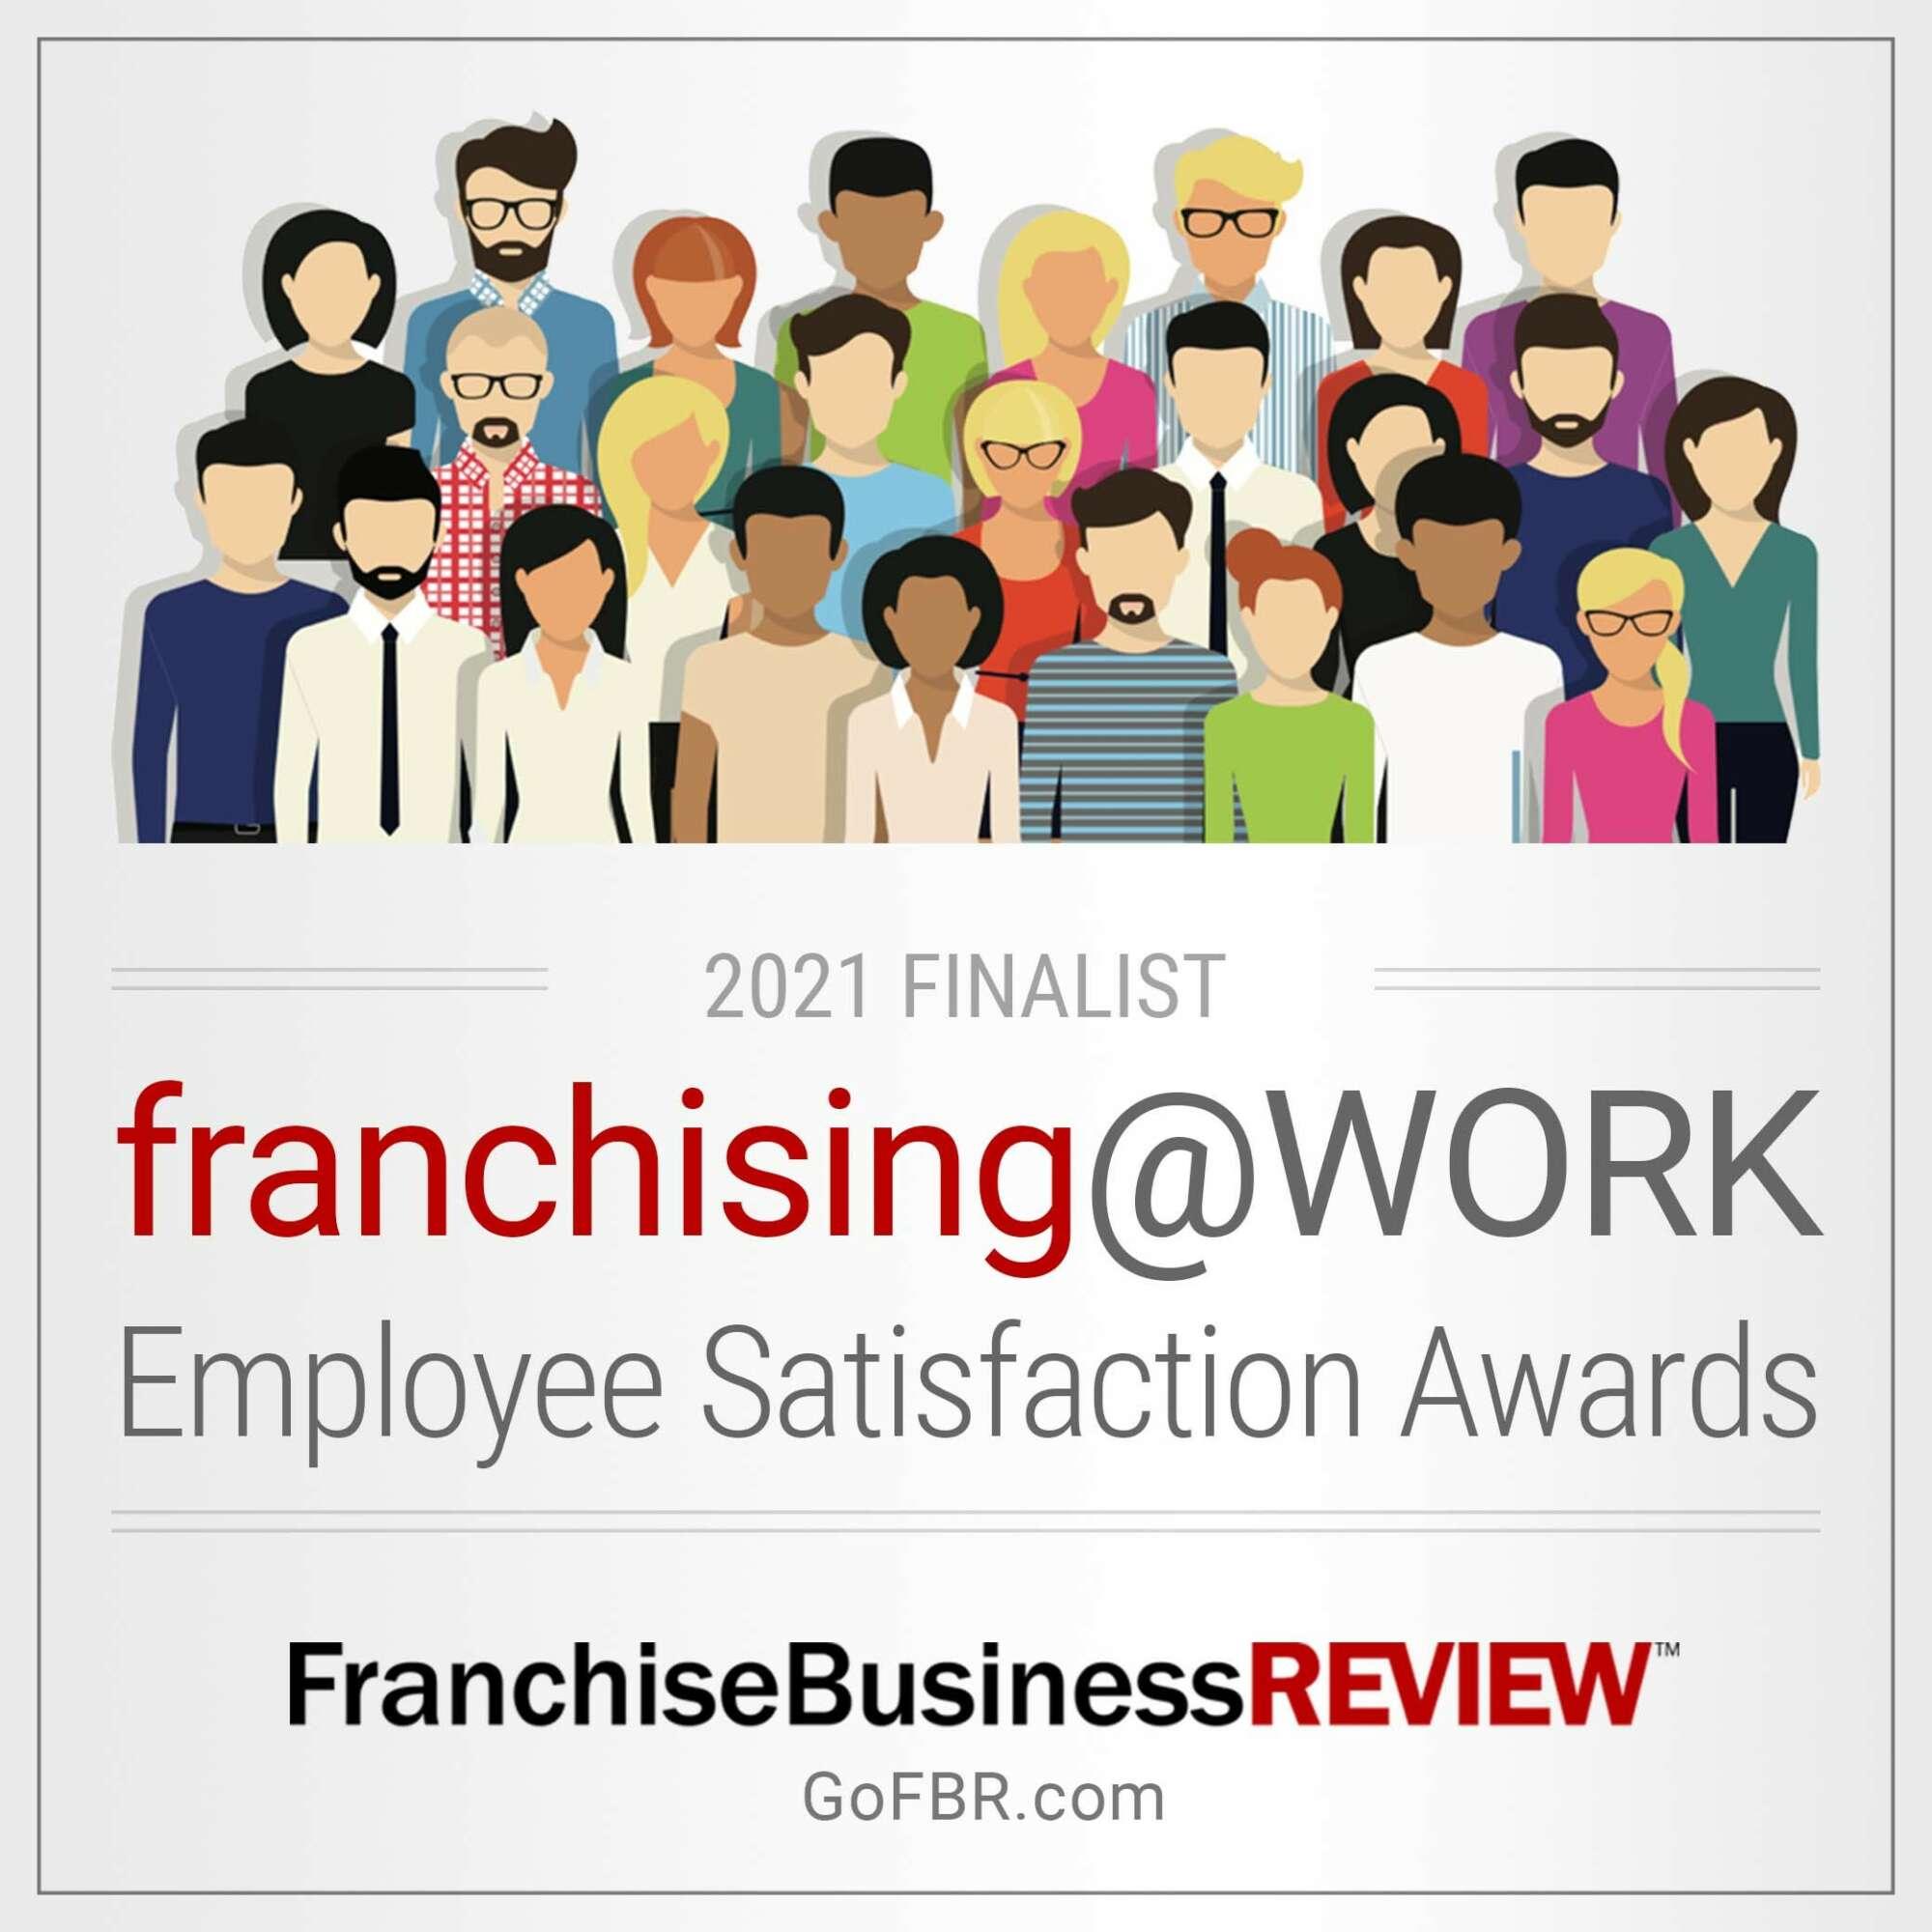 Franchising@WORK Award - 2021 Finalist